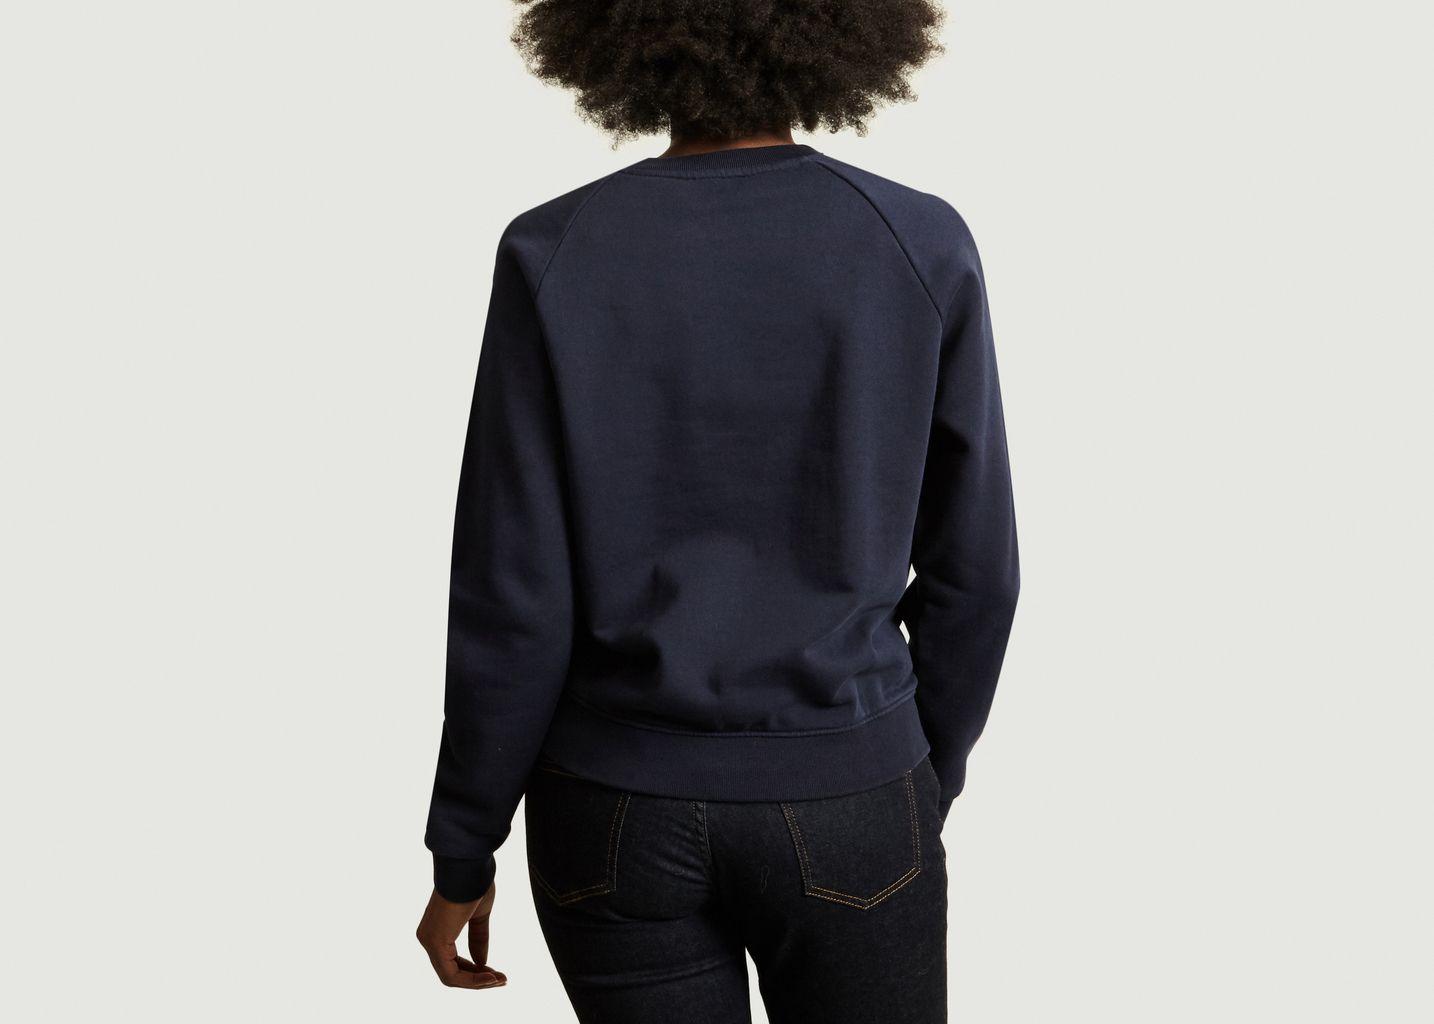 Sweatshirt Siglé Manches Raglan - Maison Kitsuné